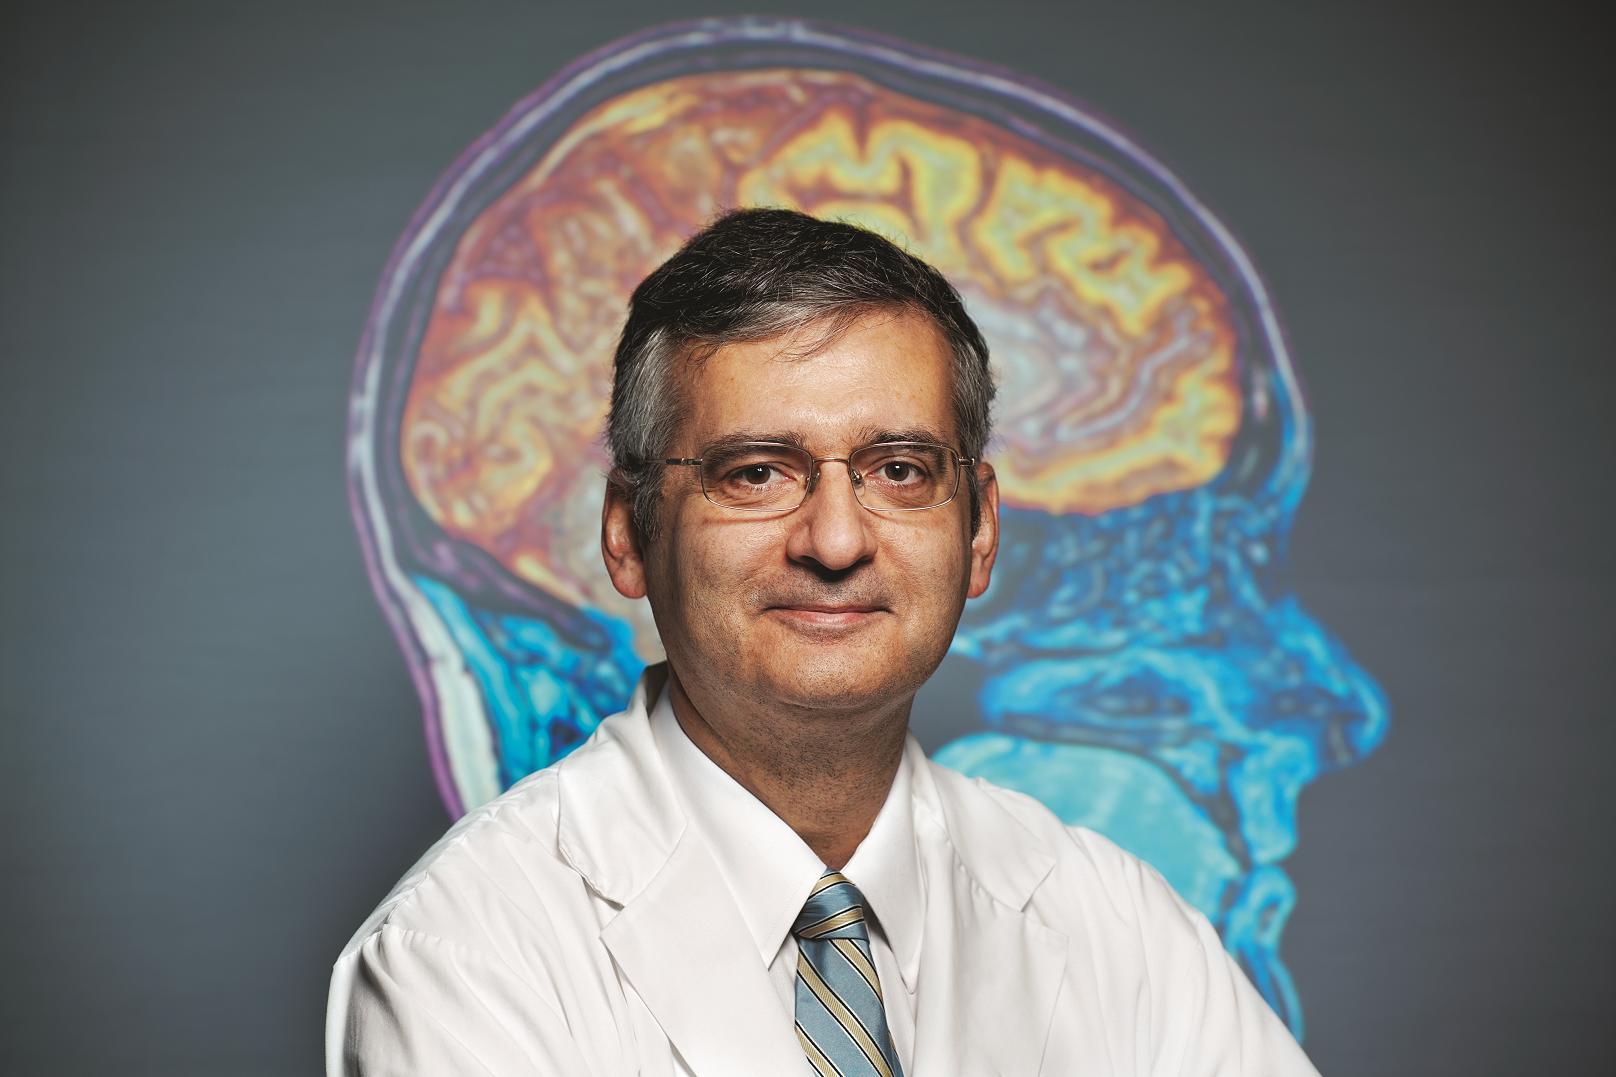 Andres Lozano, University Professor